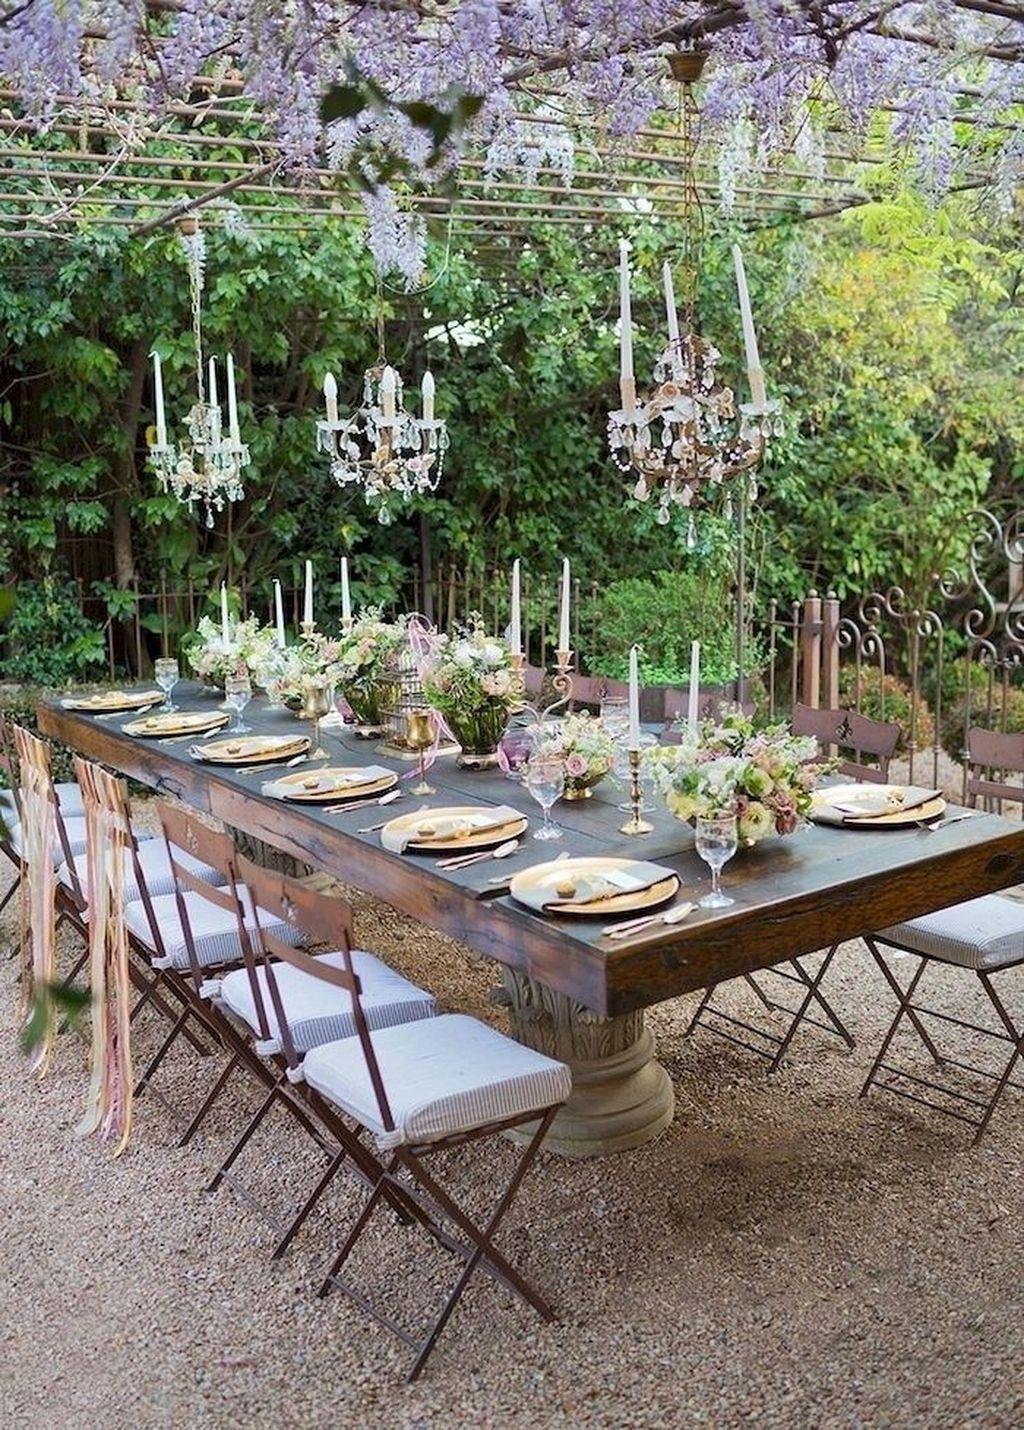 Inspiring Outdoor Dining Table Design Ideas 03